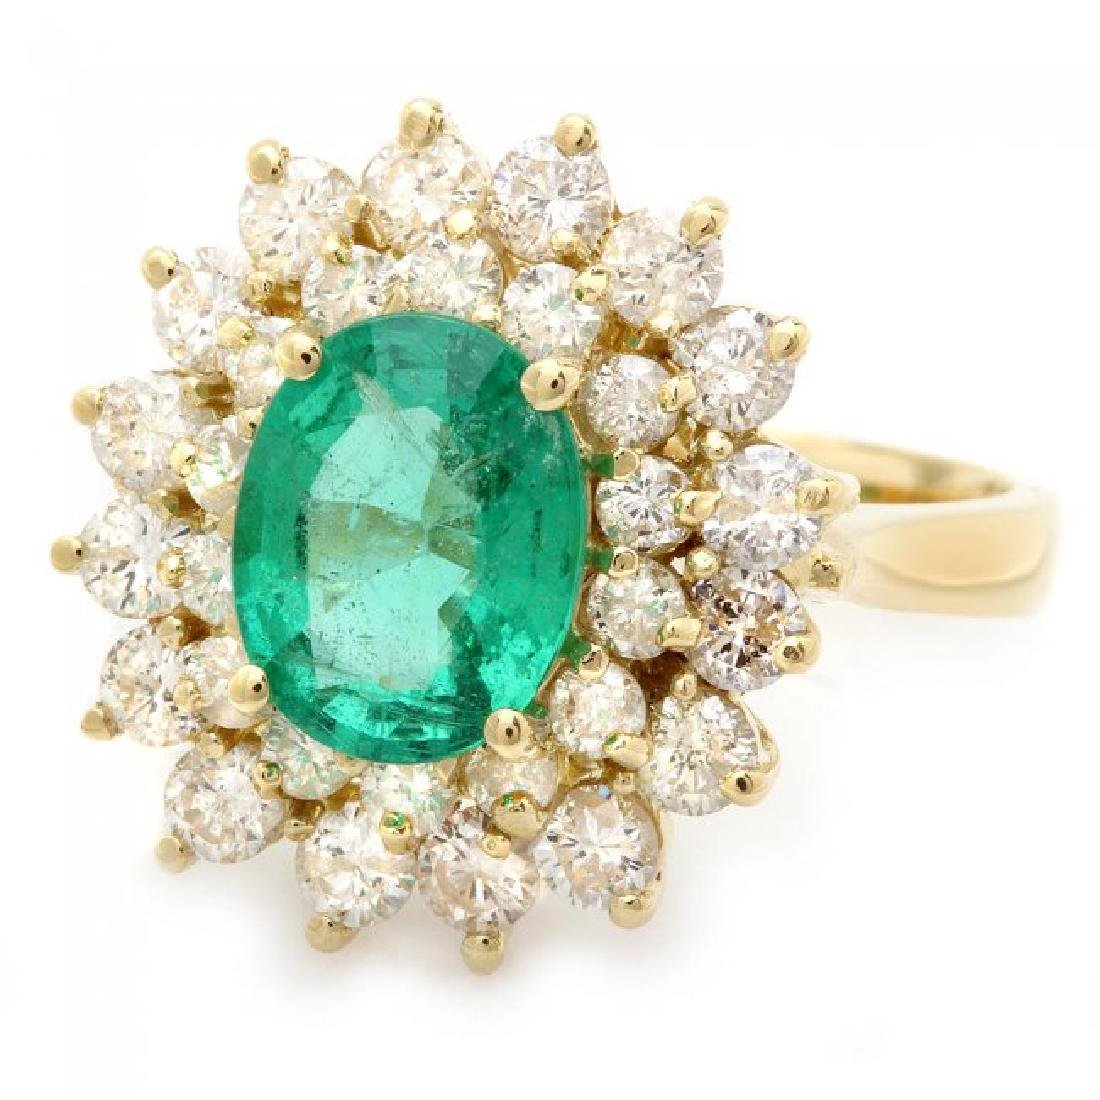 18k Gold 1.75ct Emerald 1.50ct Diamond Ring - 2